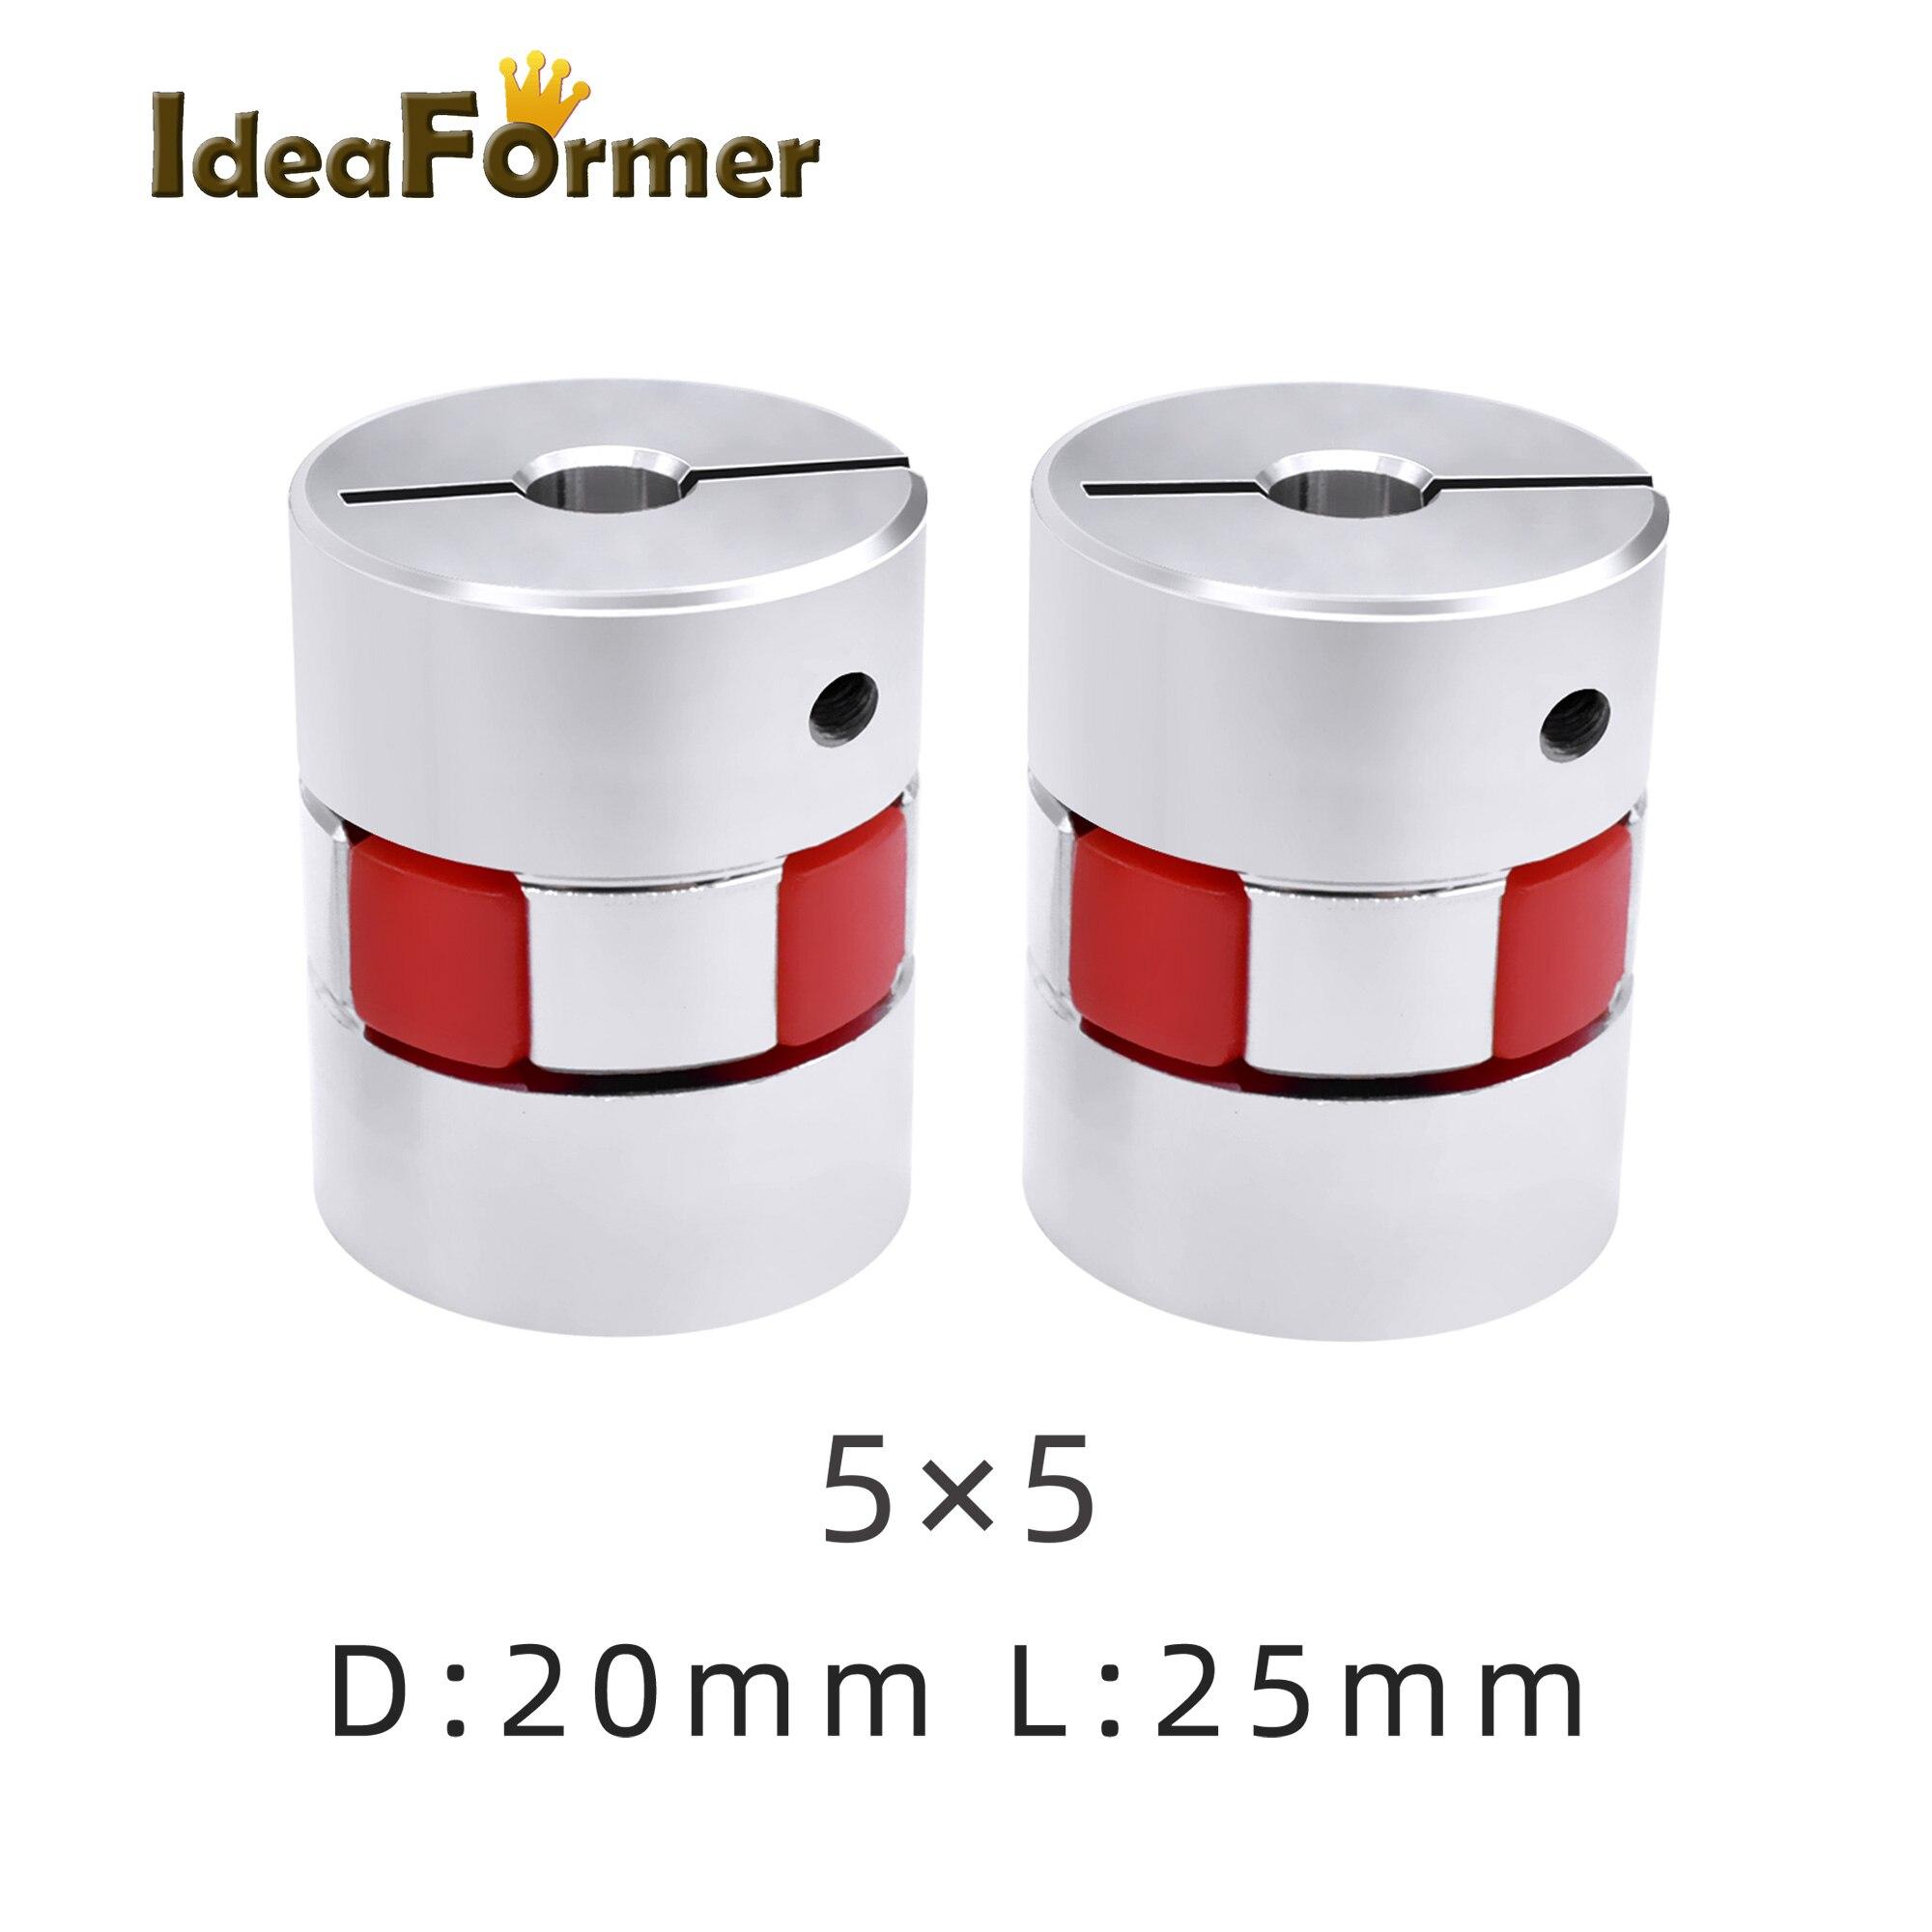 Set Screw Type 19 mm and 1 mm Bore Diameter A2017 Aluminum NBK MJC-55-WH-19-1 Jaw Flexible Coupling